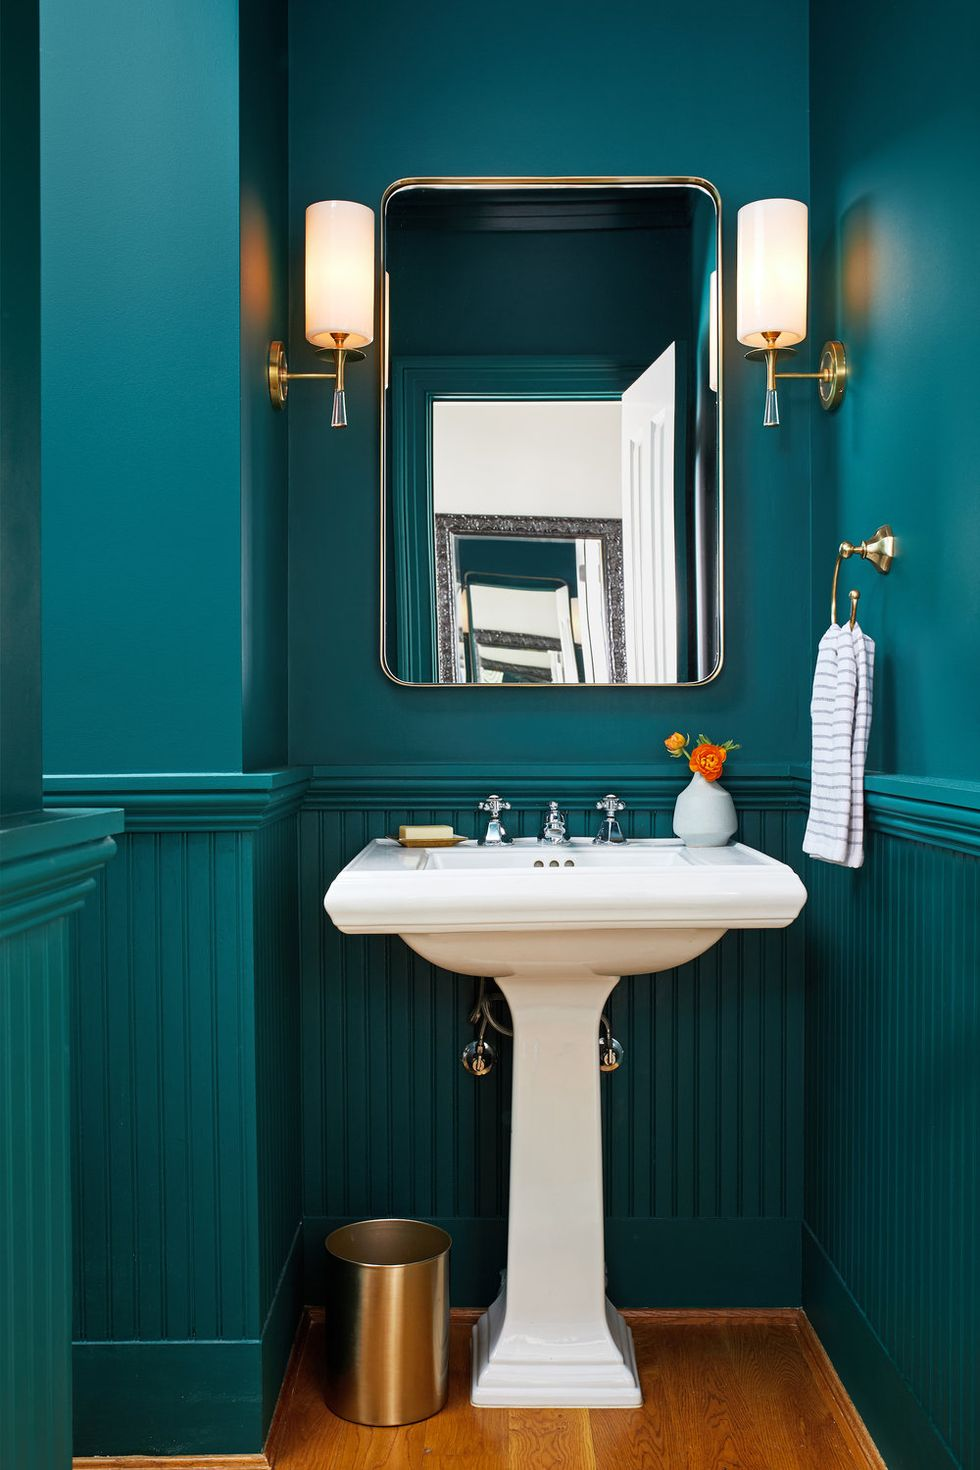 10 Rooms That Made Great Use Of Teal Paint Teal Bathroom Decor Peacock Bathroom Decor Modern Style Bathroom